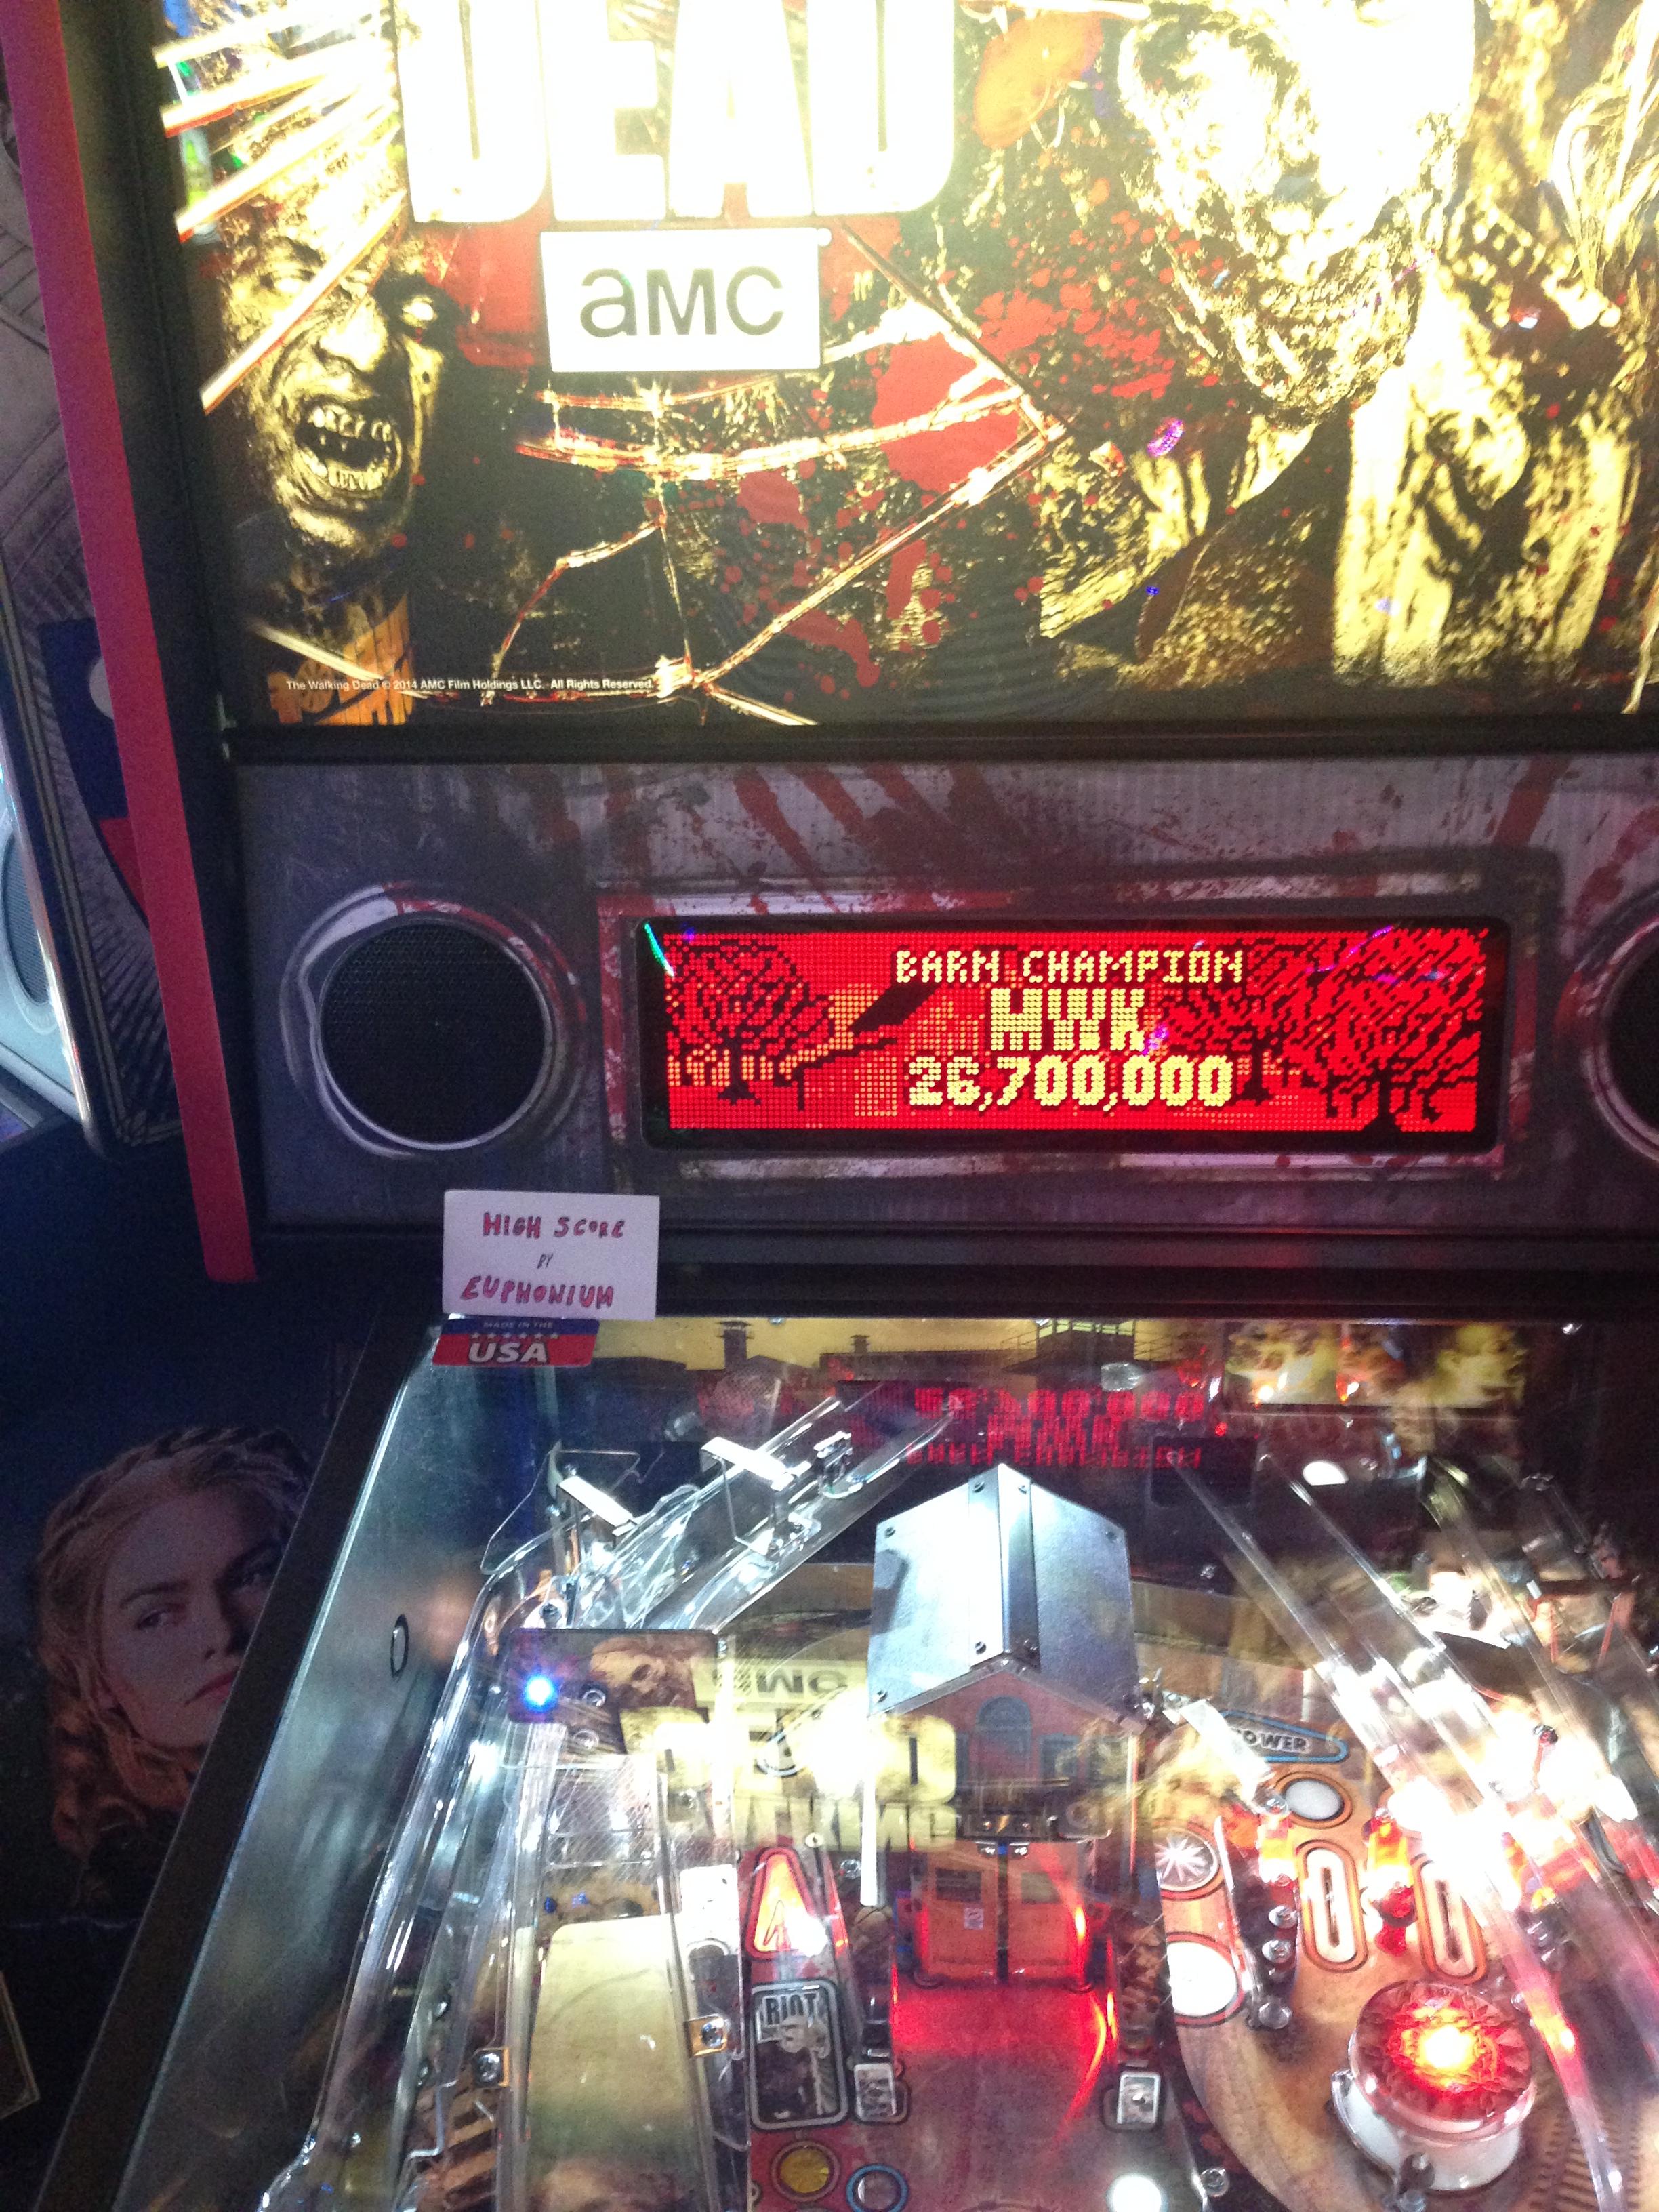 euphonium: The Walking Dead: Barn Champion (Pinball Bonus Mode) 26,700,000 points on 2017-03-04 08:36:19